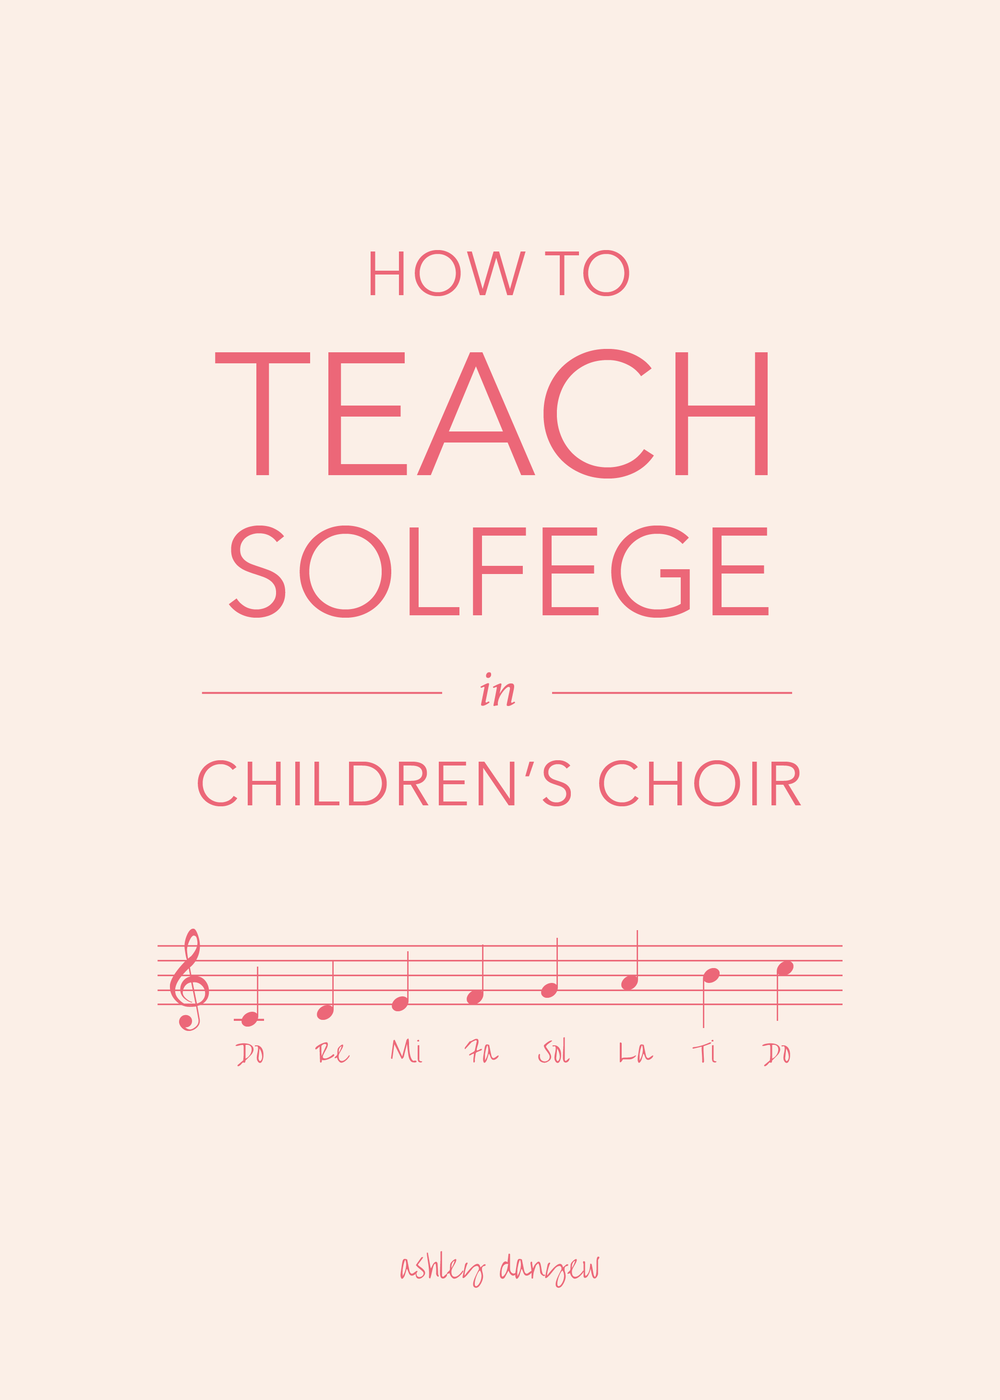 Copy of How to Teach Solfege in Children's Choir